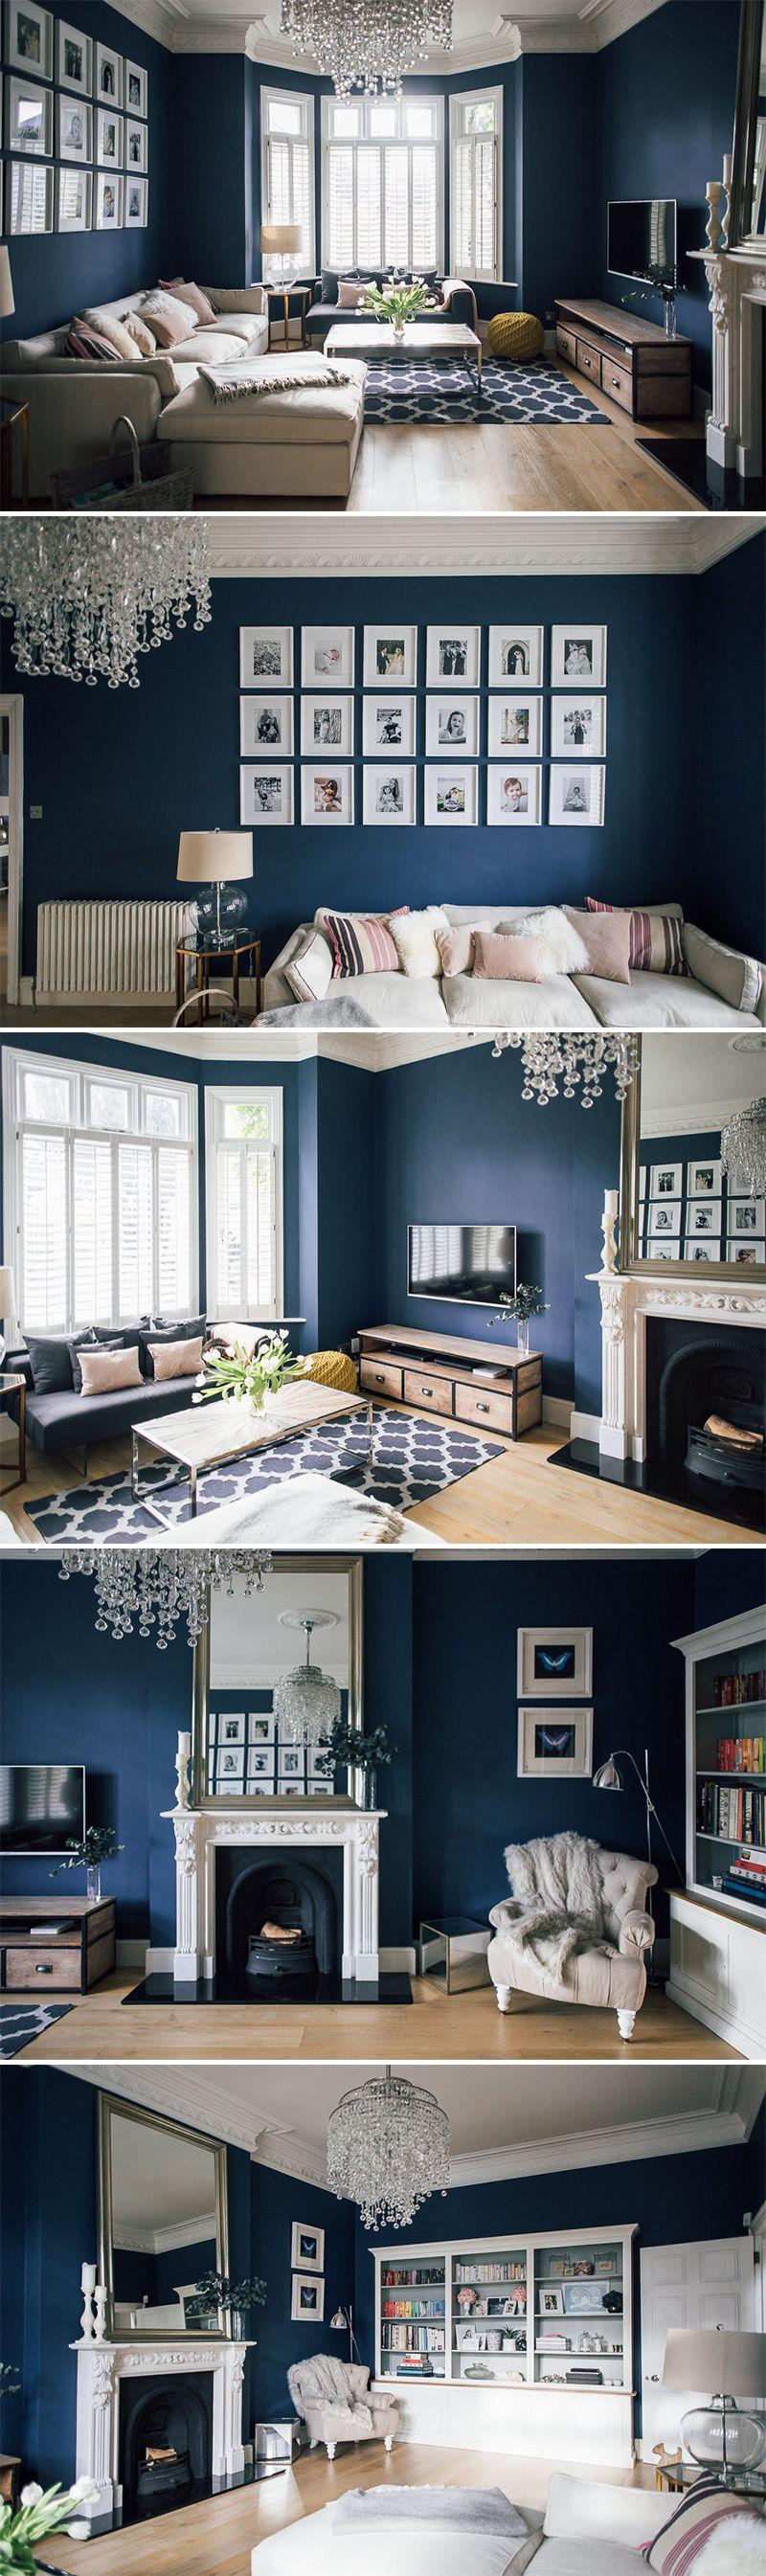 Leomas Awe Inspiring London Home Sitting Room DecorSitting